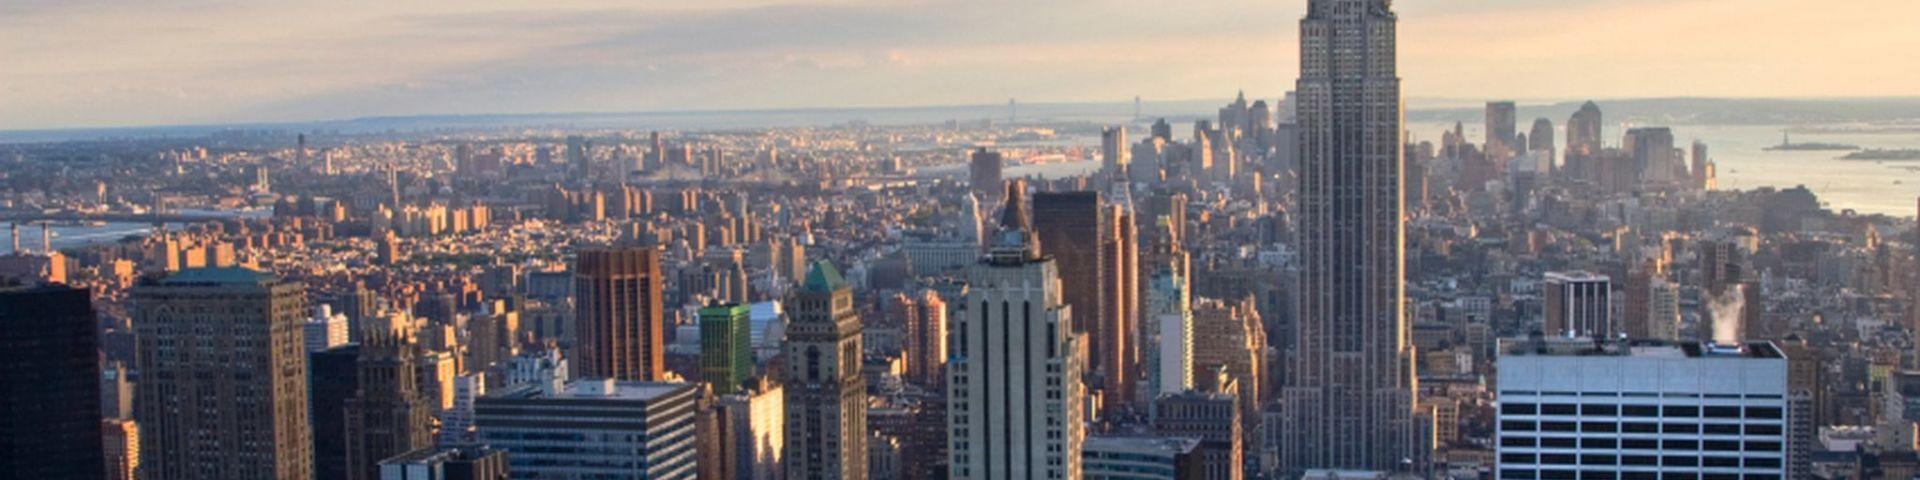 New York : 5 nuits dans des hôtels 4* et 5*